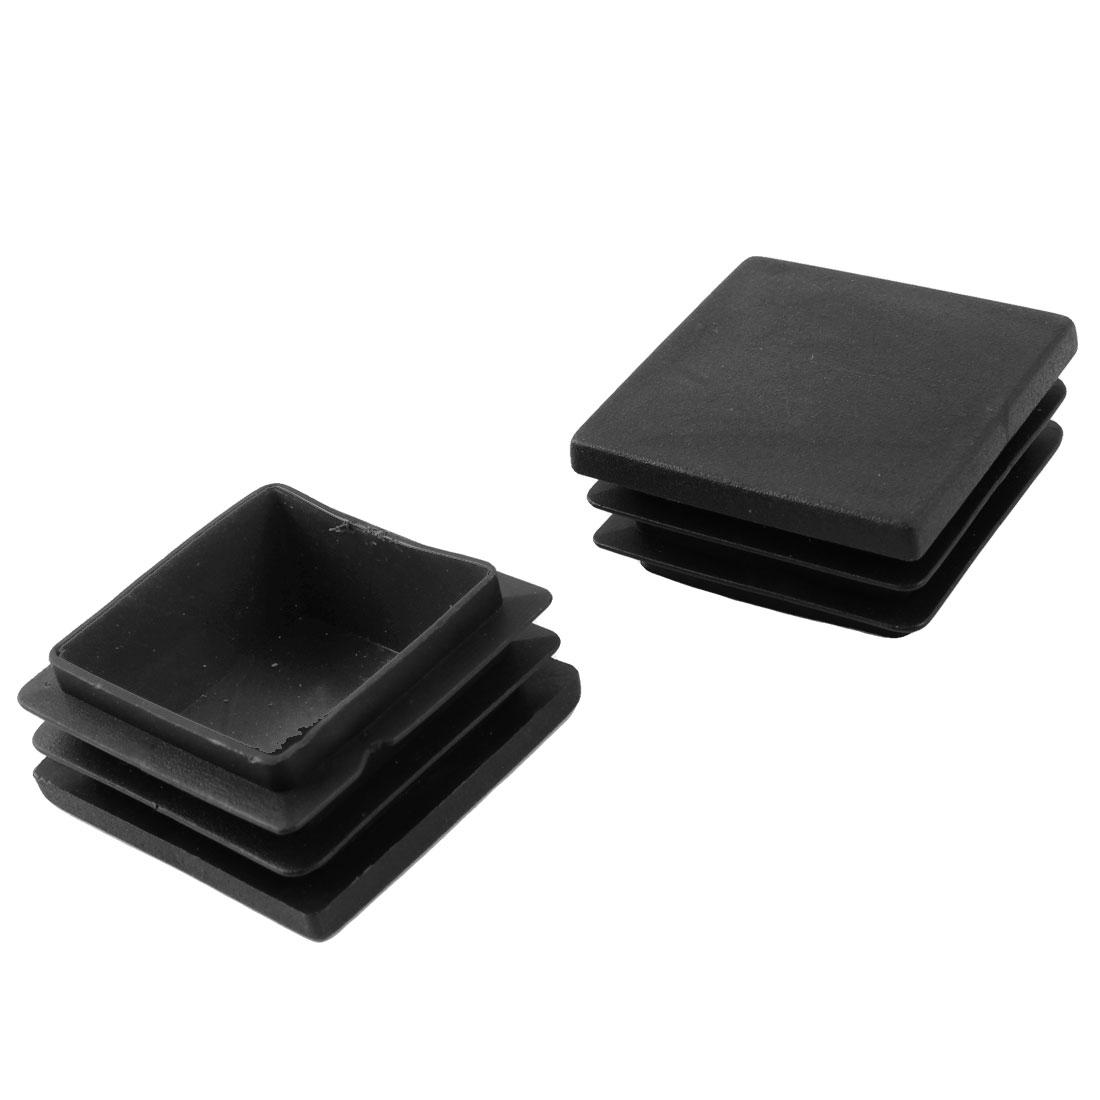 40mm x 40mm Black Hard Plastic Tubing Tube Insert Blanking End Caps 2 Pcs